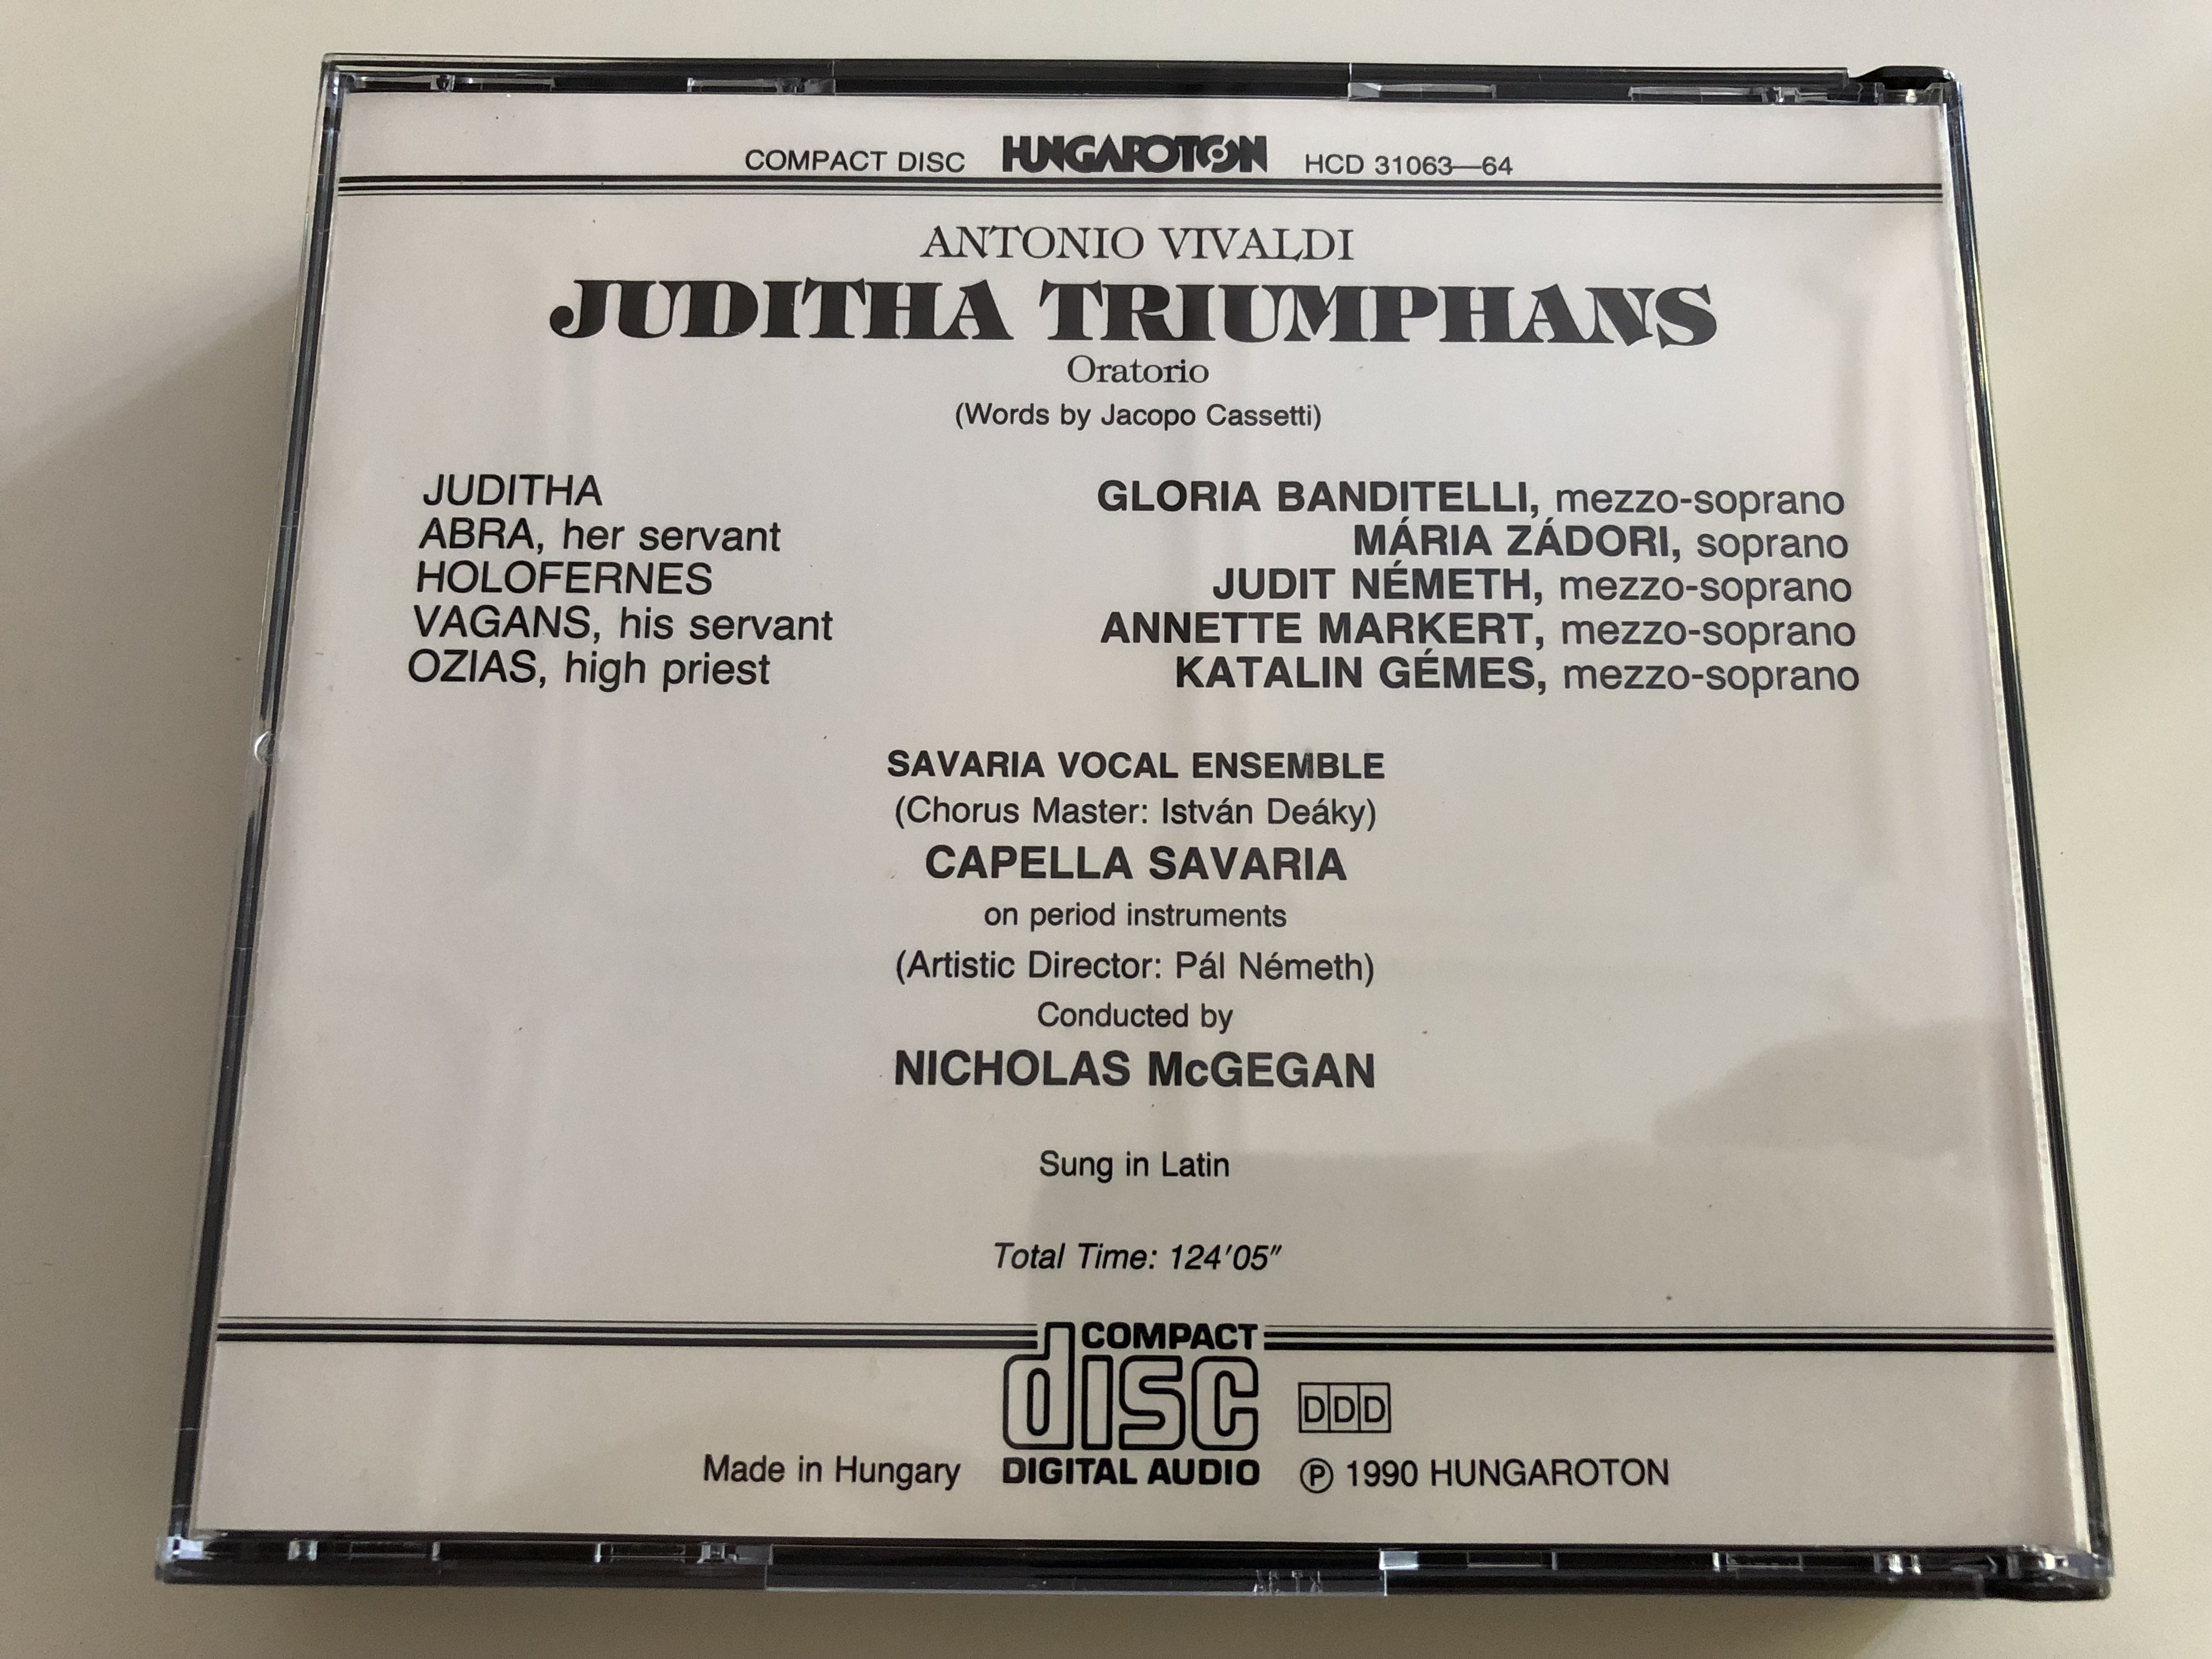 antonio-vivaldi-juditha-triumphans-oratorio-gloria-banditelli-m-ria-z-dori-judit-n-meth-annette-markert-katalin-g-mes-capella-savaria-leader-nicholas-mcgegan-audio-cd-set-hcd-31063-64-4-.jpg